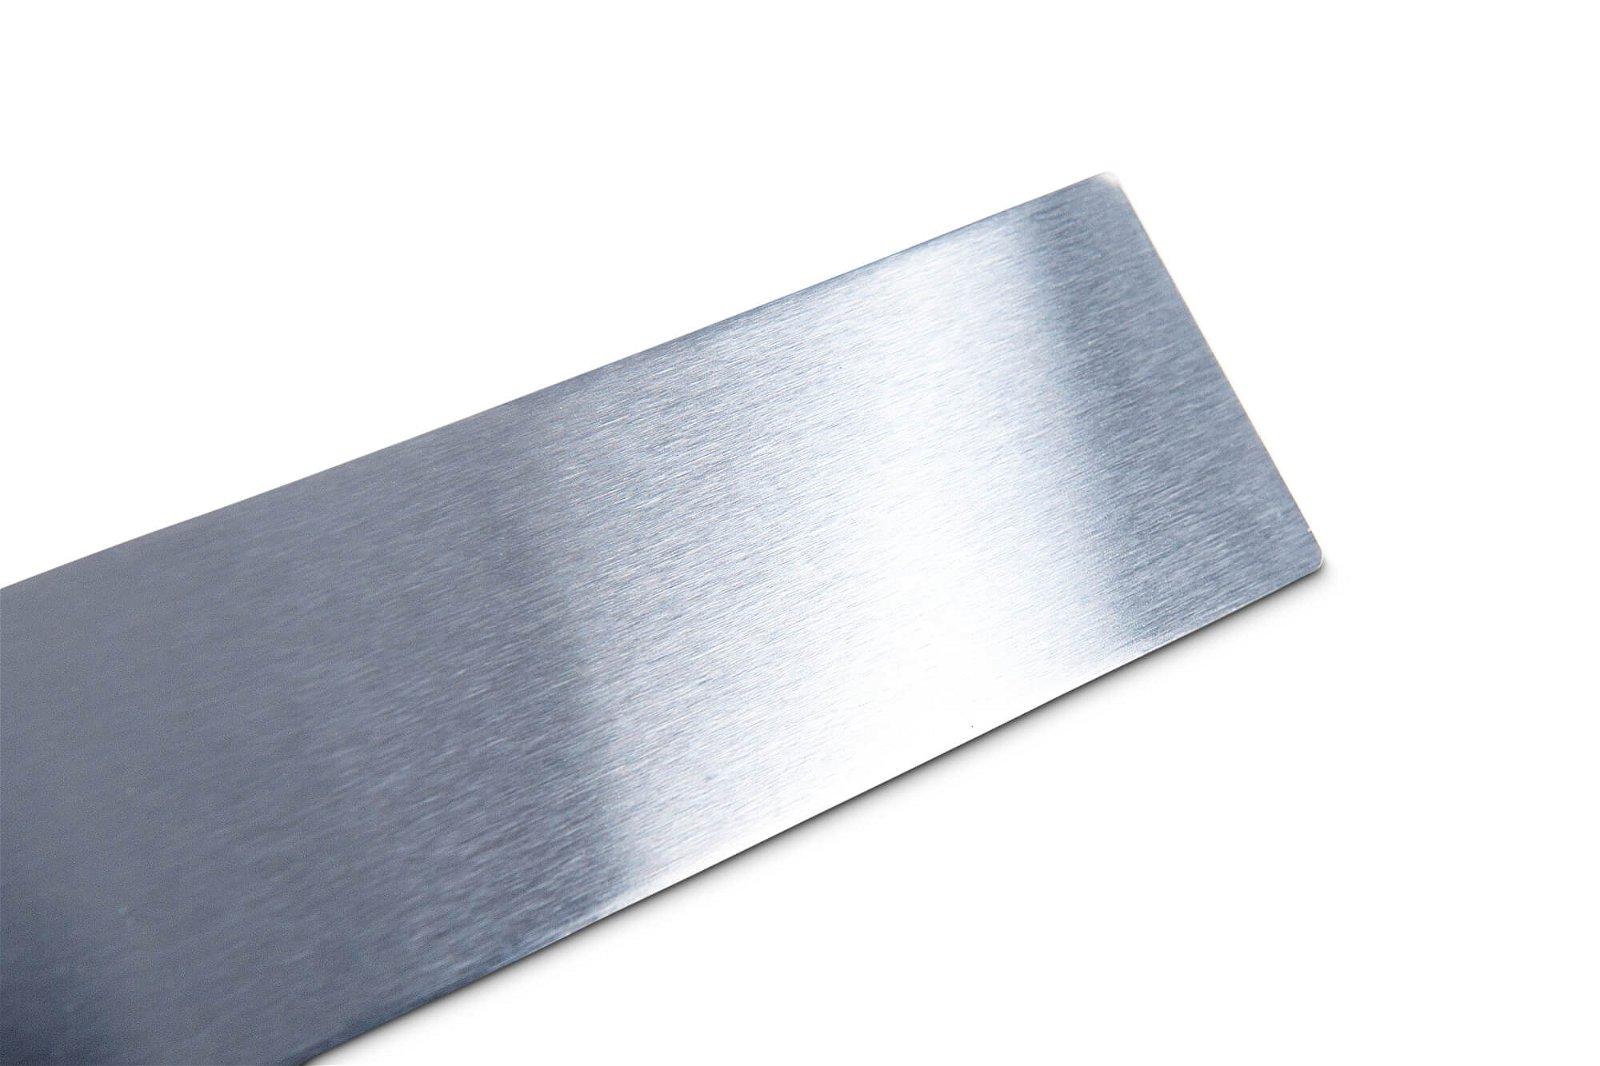 Ferroleiste MAULsolid, Edelstahl, Länge 100 cm, silber